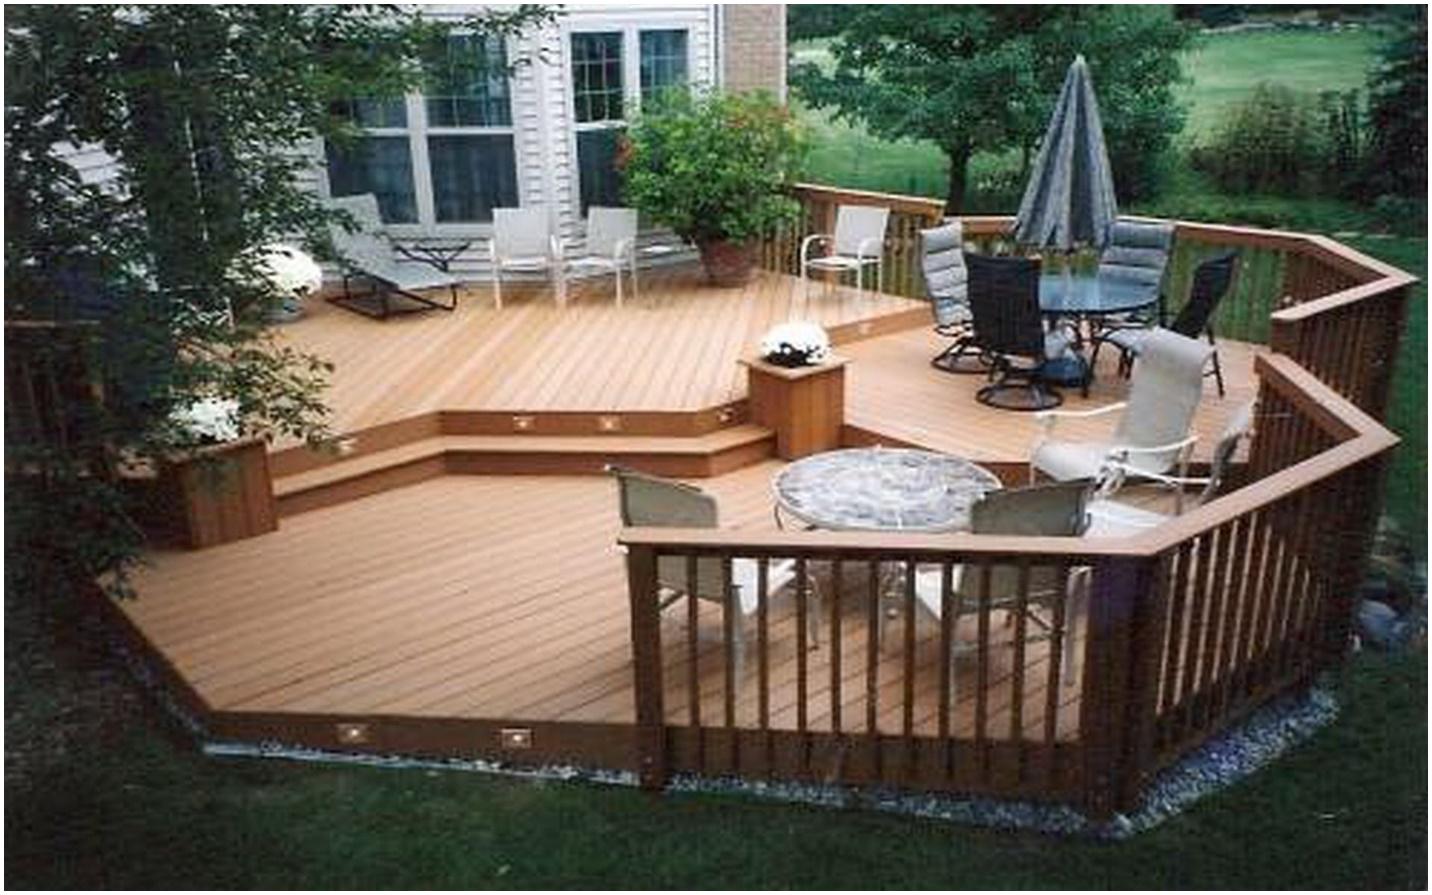 6.SIMPHOME.COM Wooden Backyard Patio with Simple Plant Palette